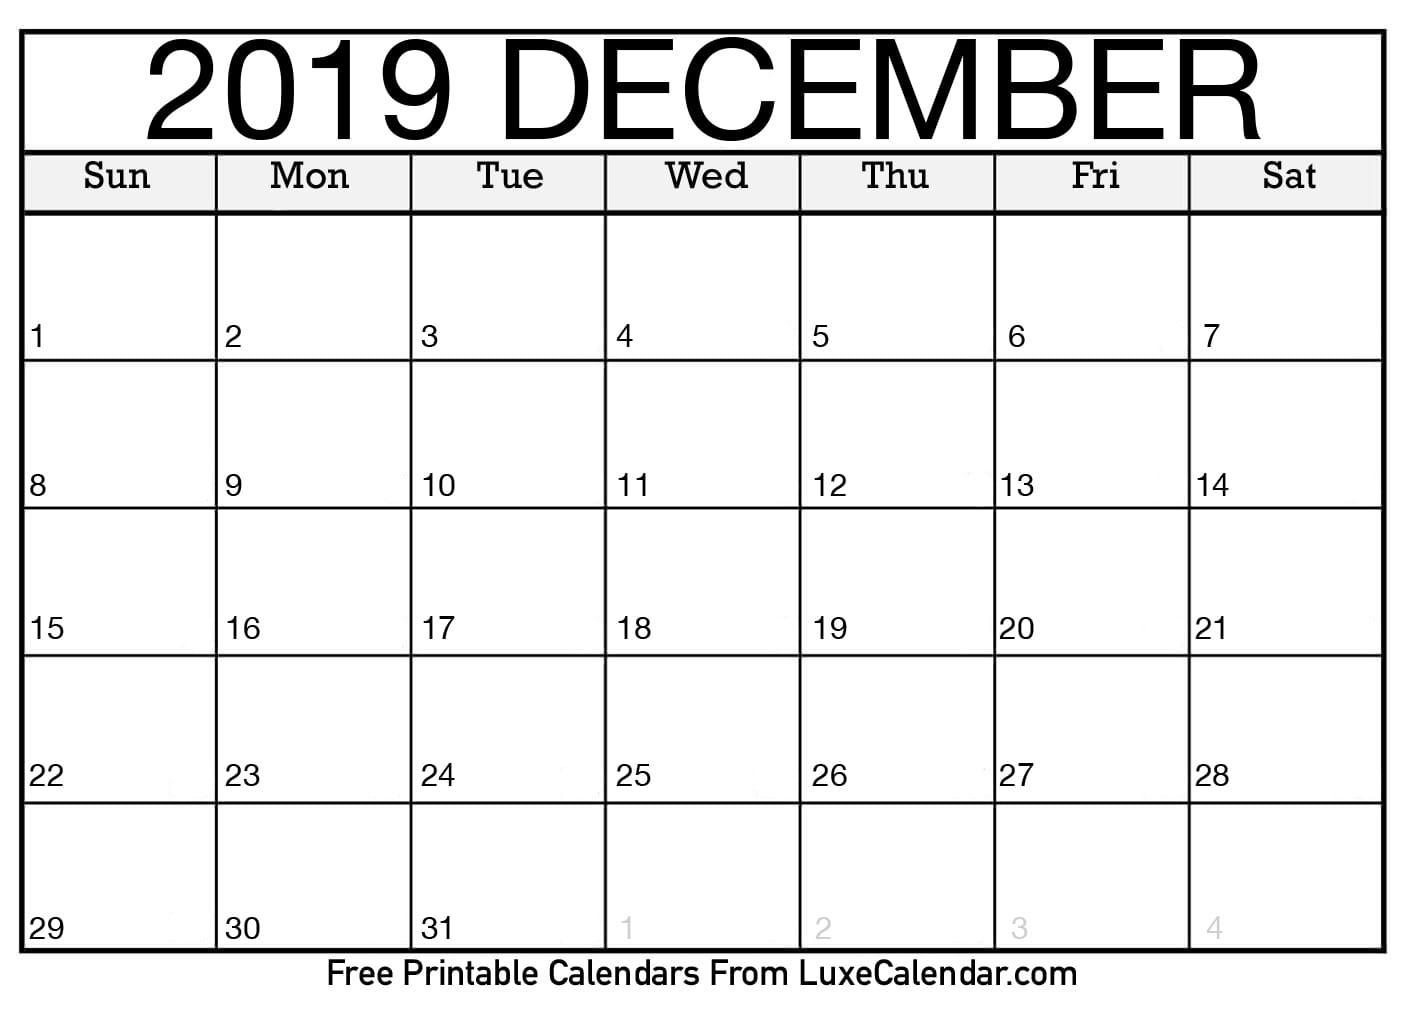 Blank December 2019 Calendar Printable - Luxe Calendar with December Calendar Printable Template